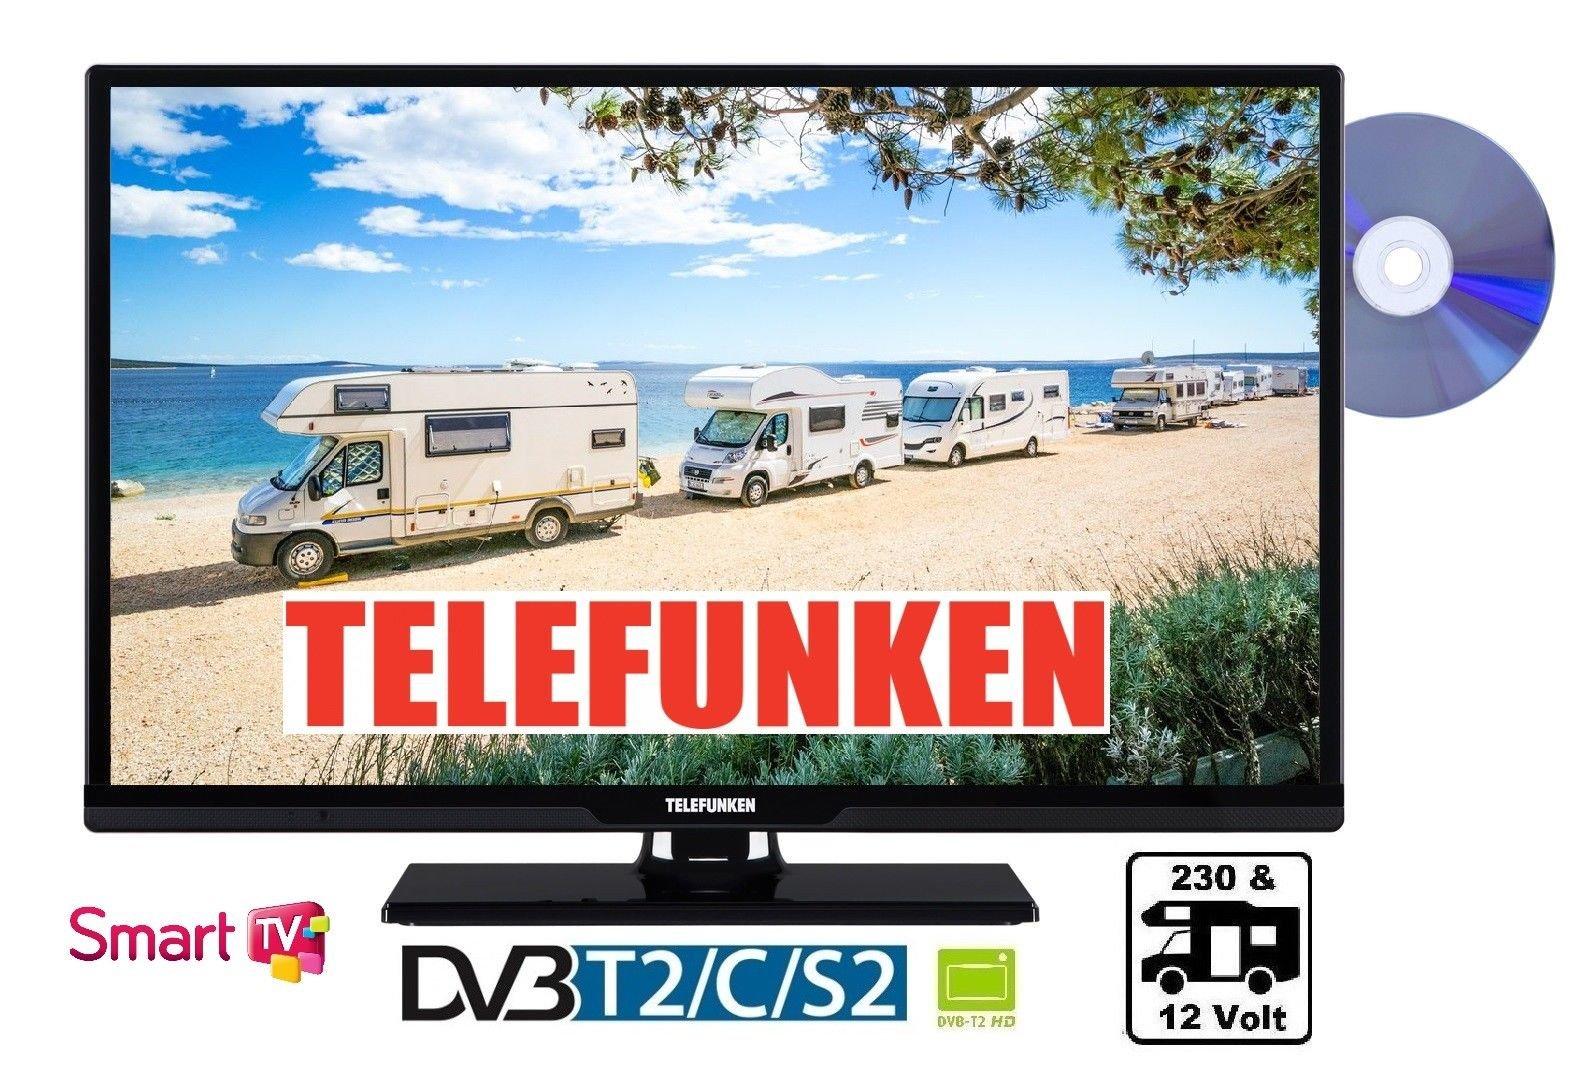 Telefunken 24 pulgadas 61 cm 12 – 24 V & 230 V DVB-C/S2/T2 HD Reproductor de DVD camping 12 V SMART TV: Amazon.es: Electrónica